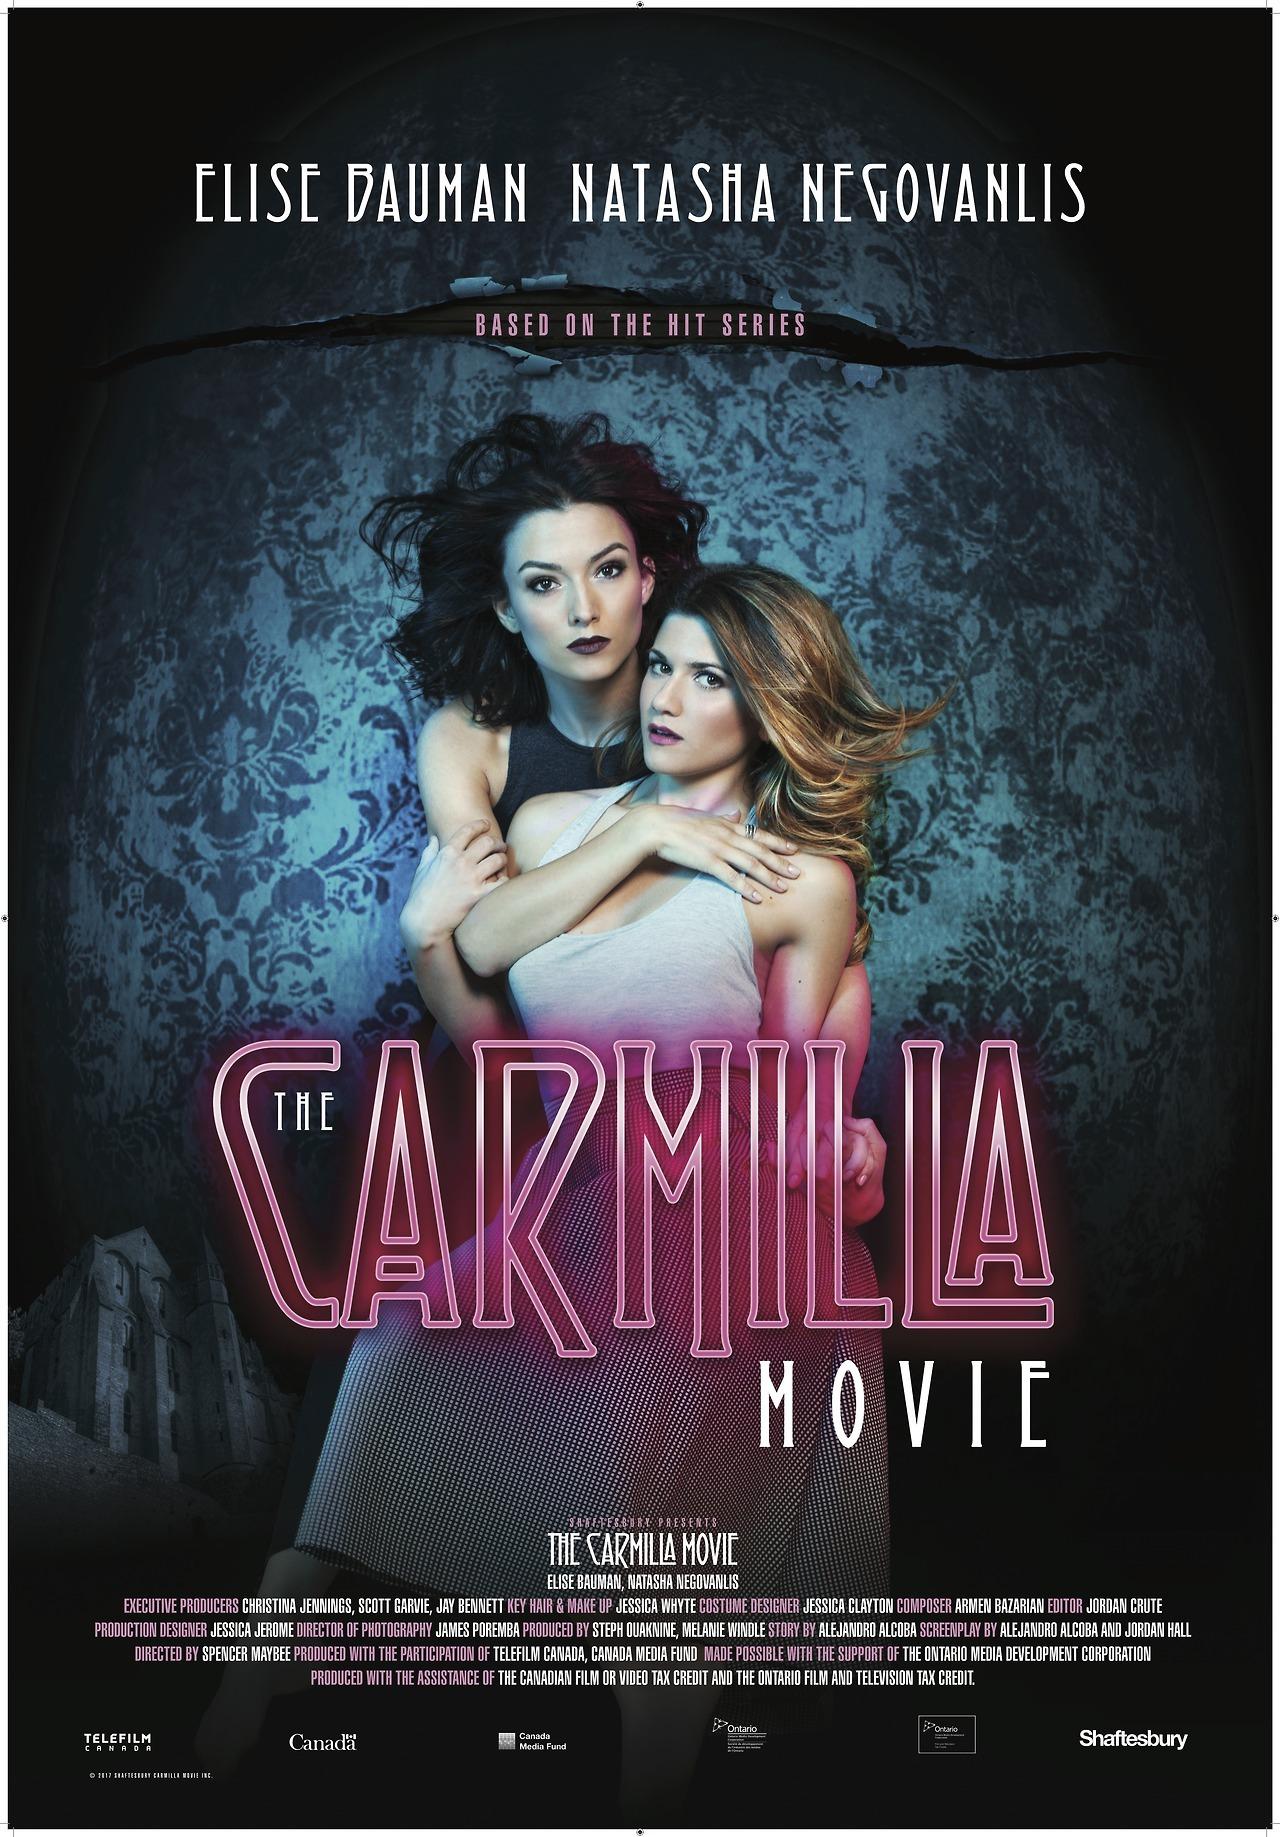 Twenty-One Days to Carmilla the Movie | LezWatchTV